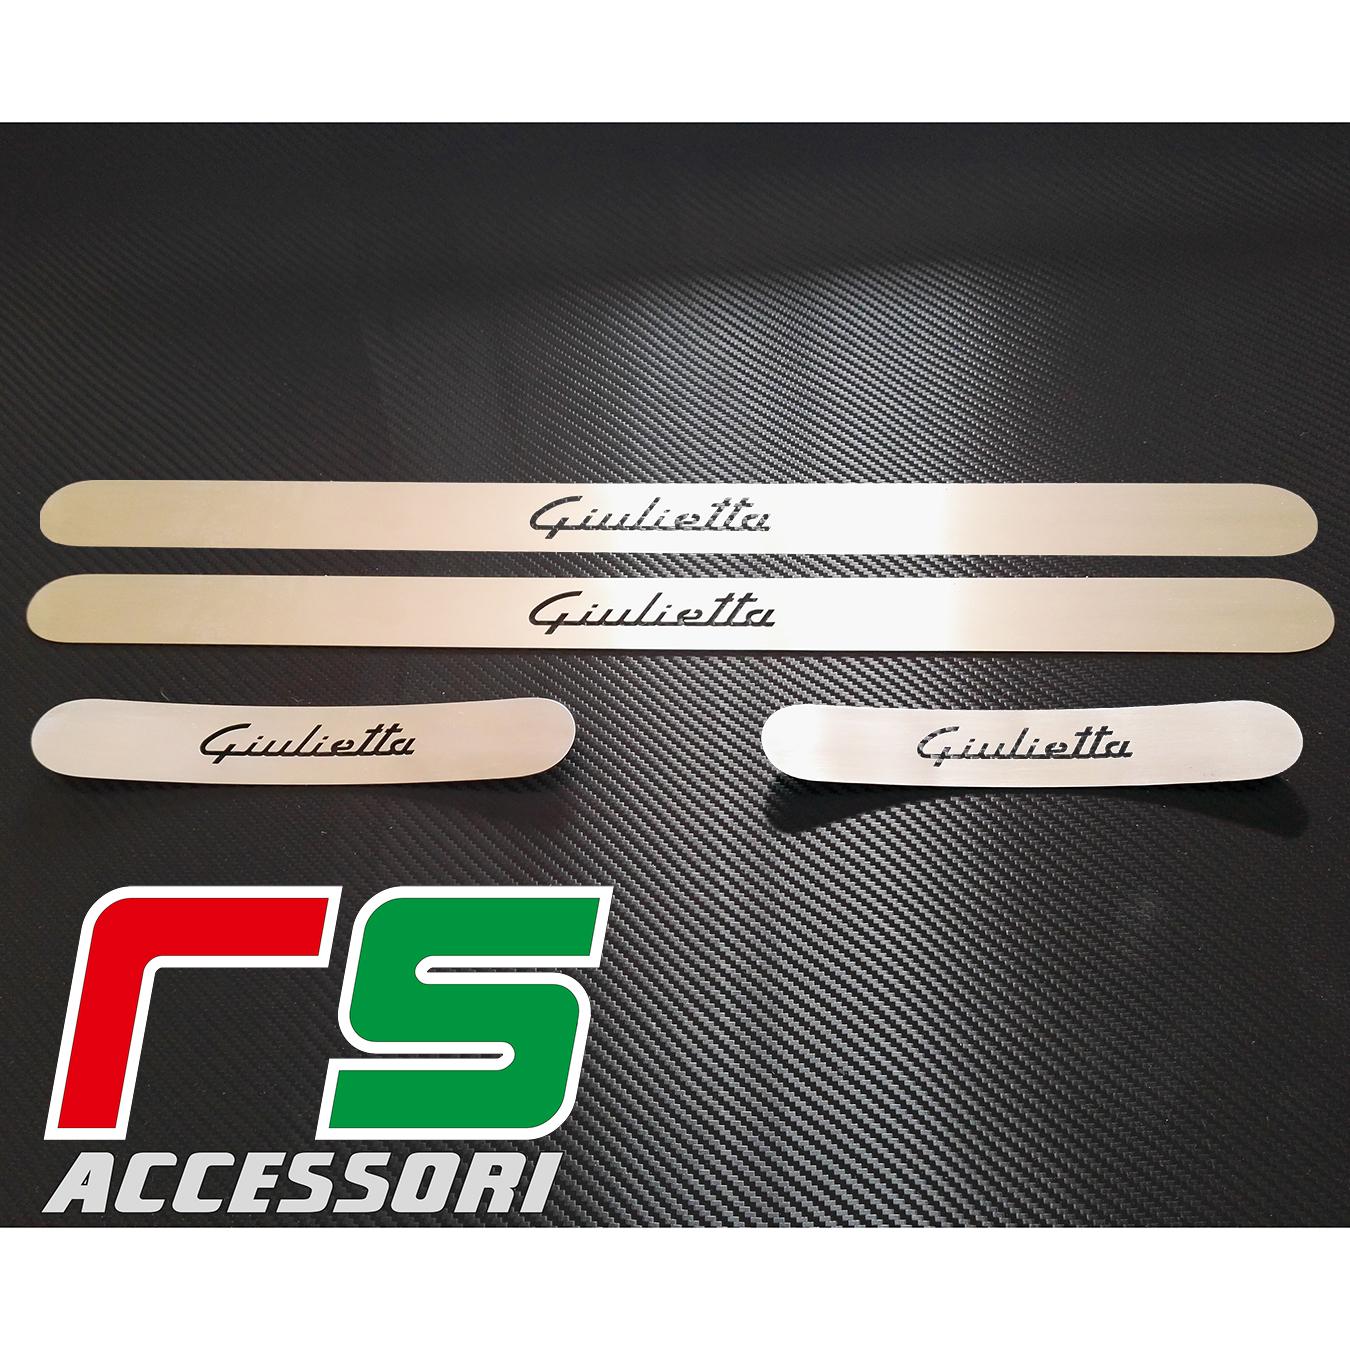 seuil de porte Alfa Romeo Giulietta seuil de porte en acier inoxydable (Copia)